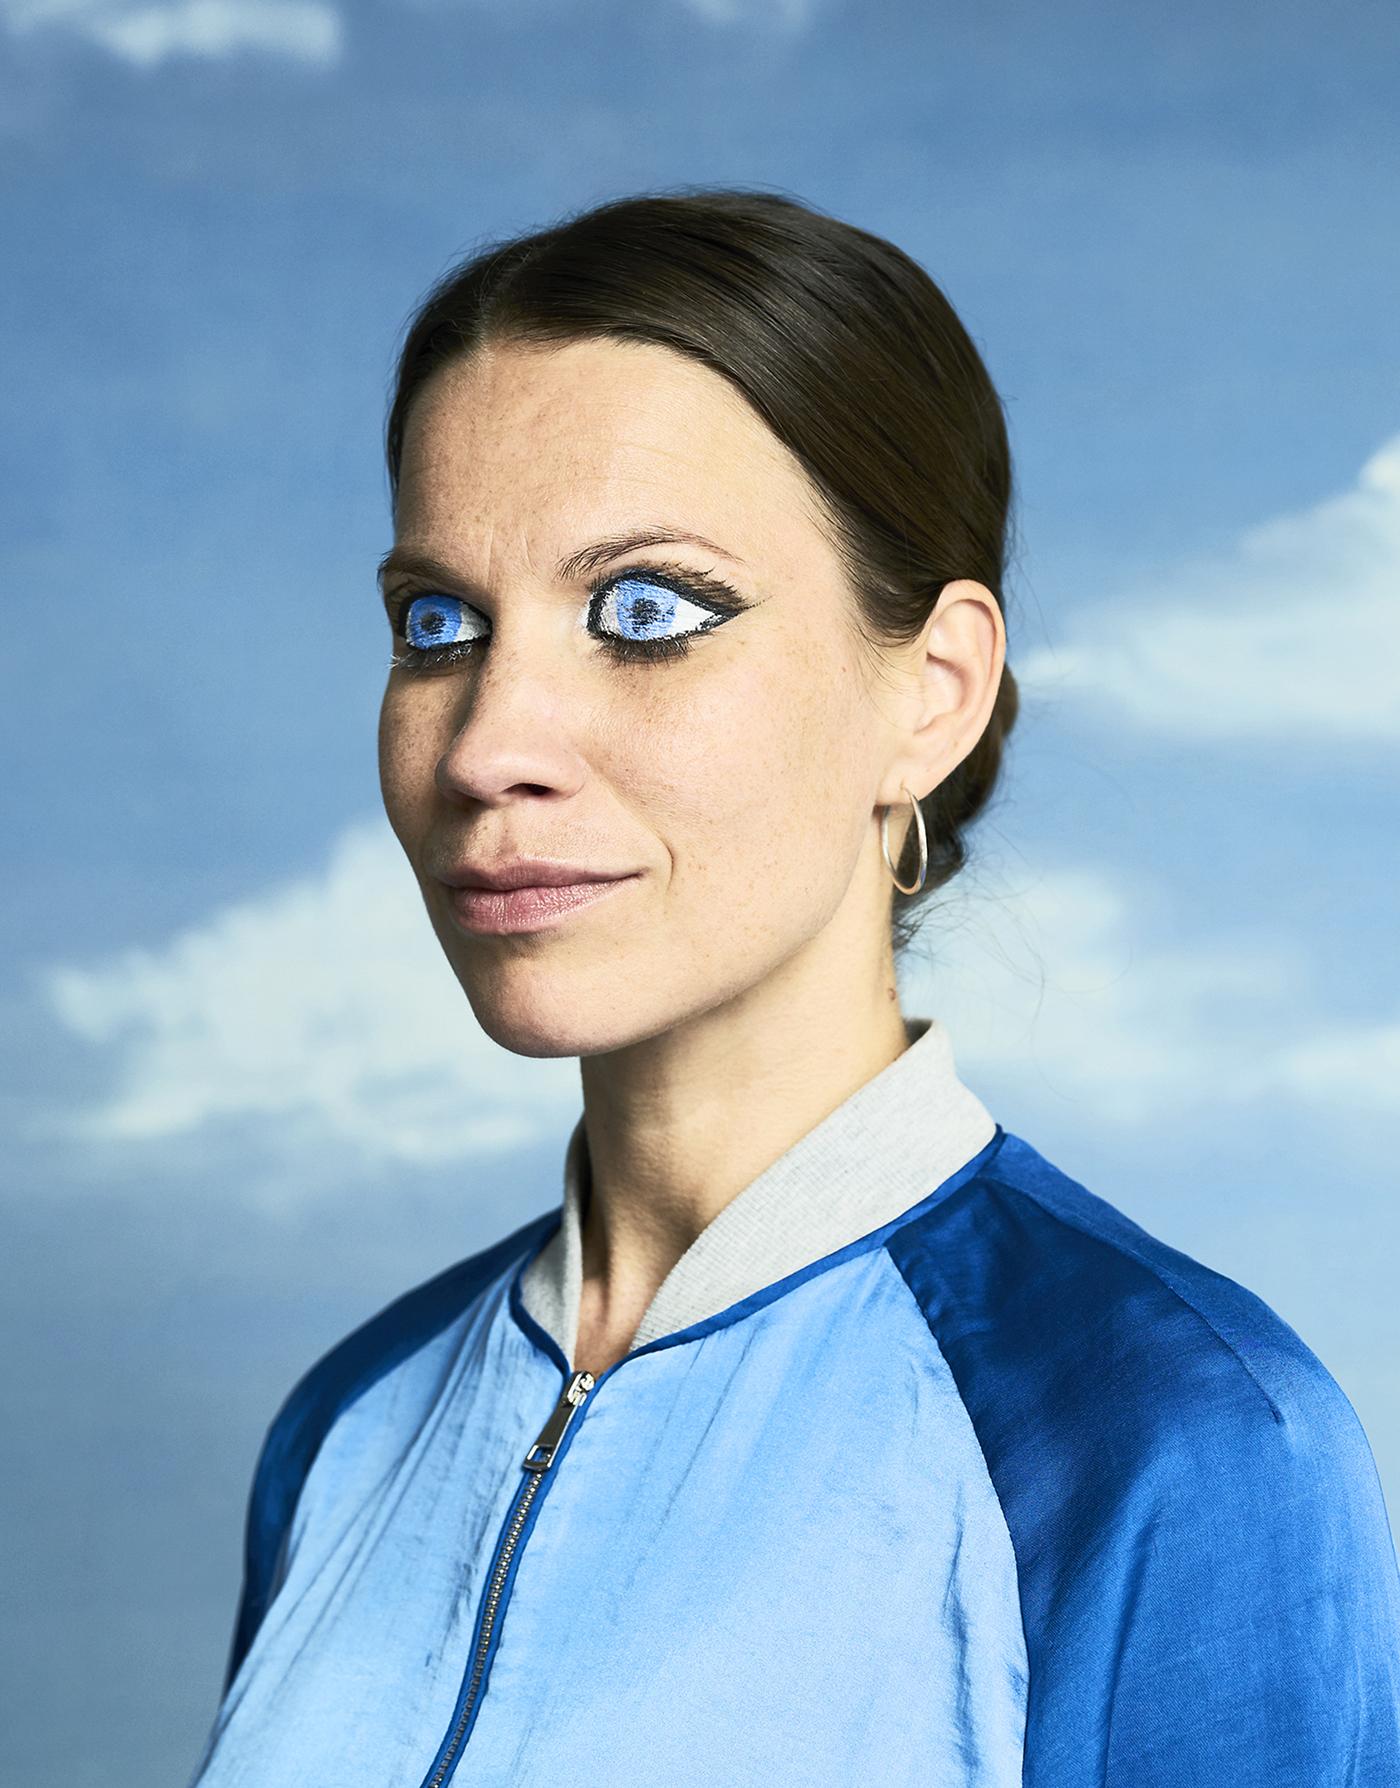 Portrait with blue eyes 2019 Vilma PimenoffforKT